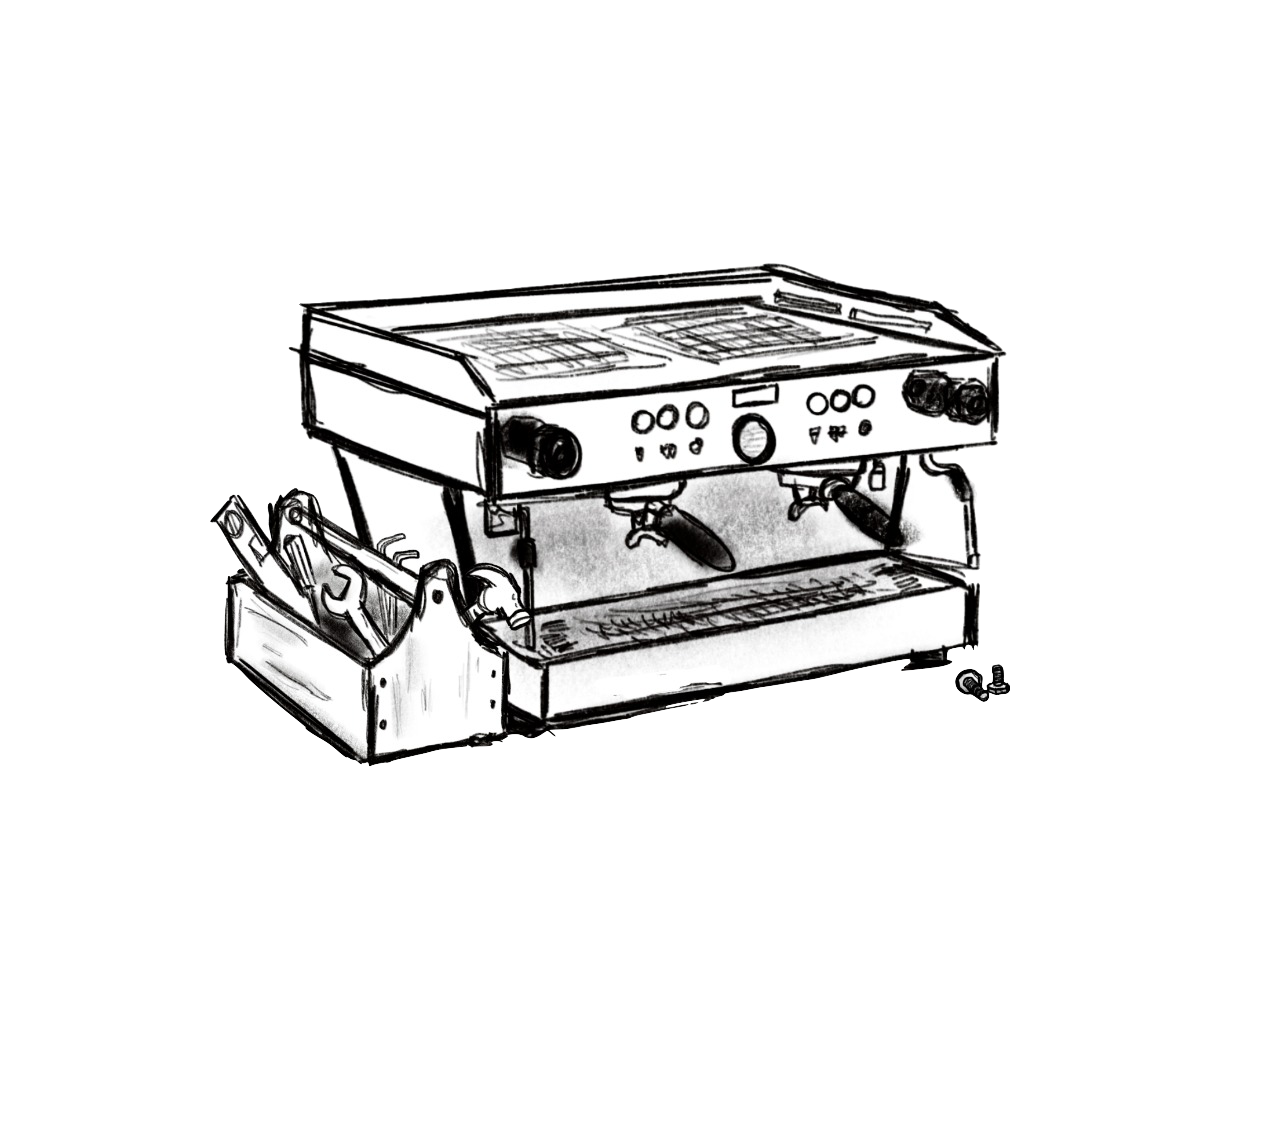 Cafe n All